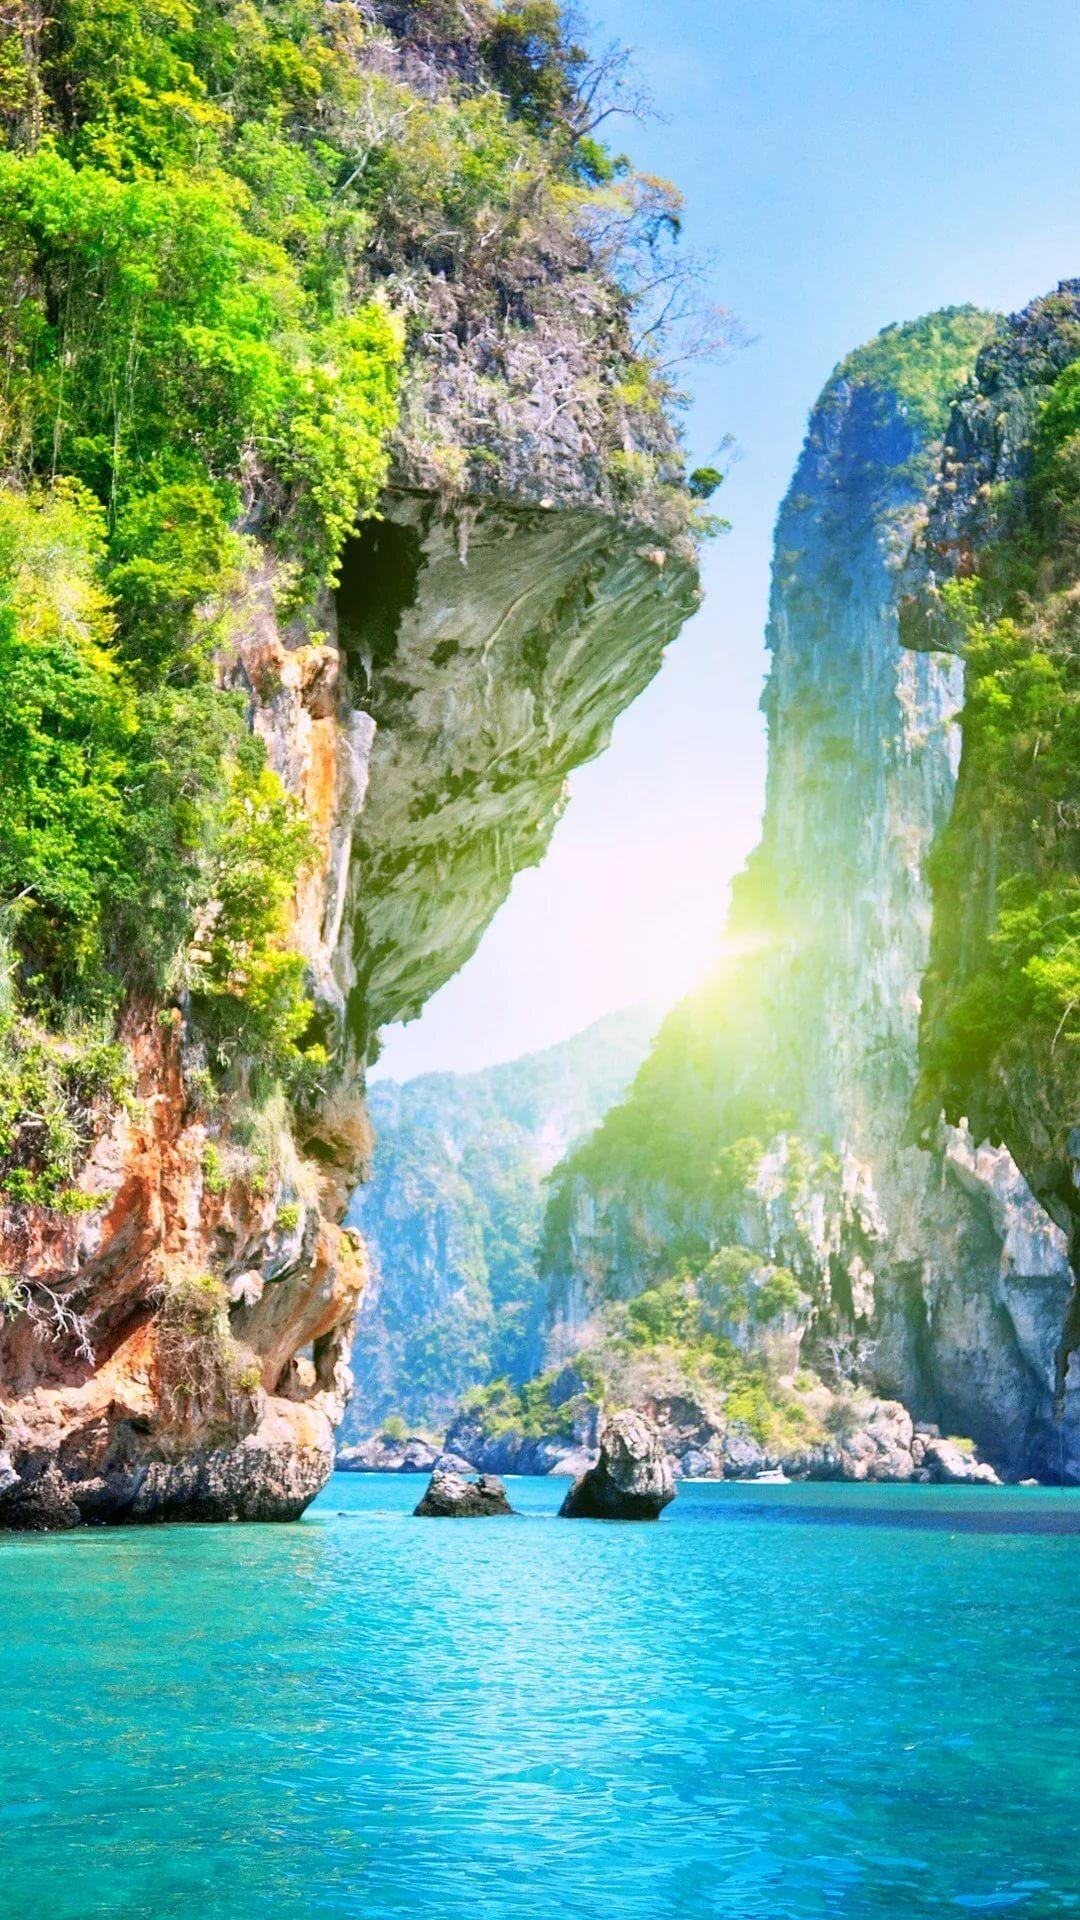 Thailand Photo Wallpaper Iphone